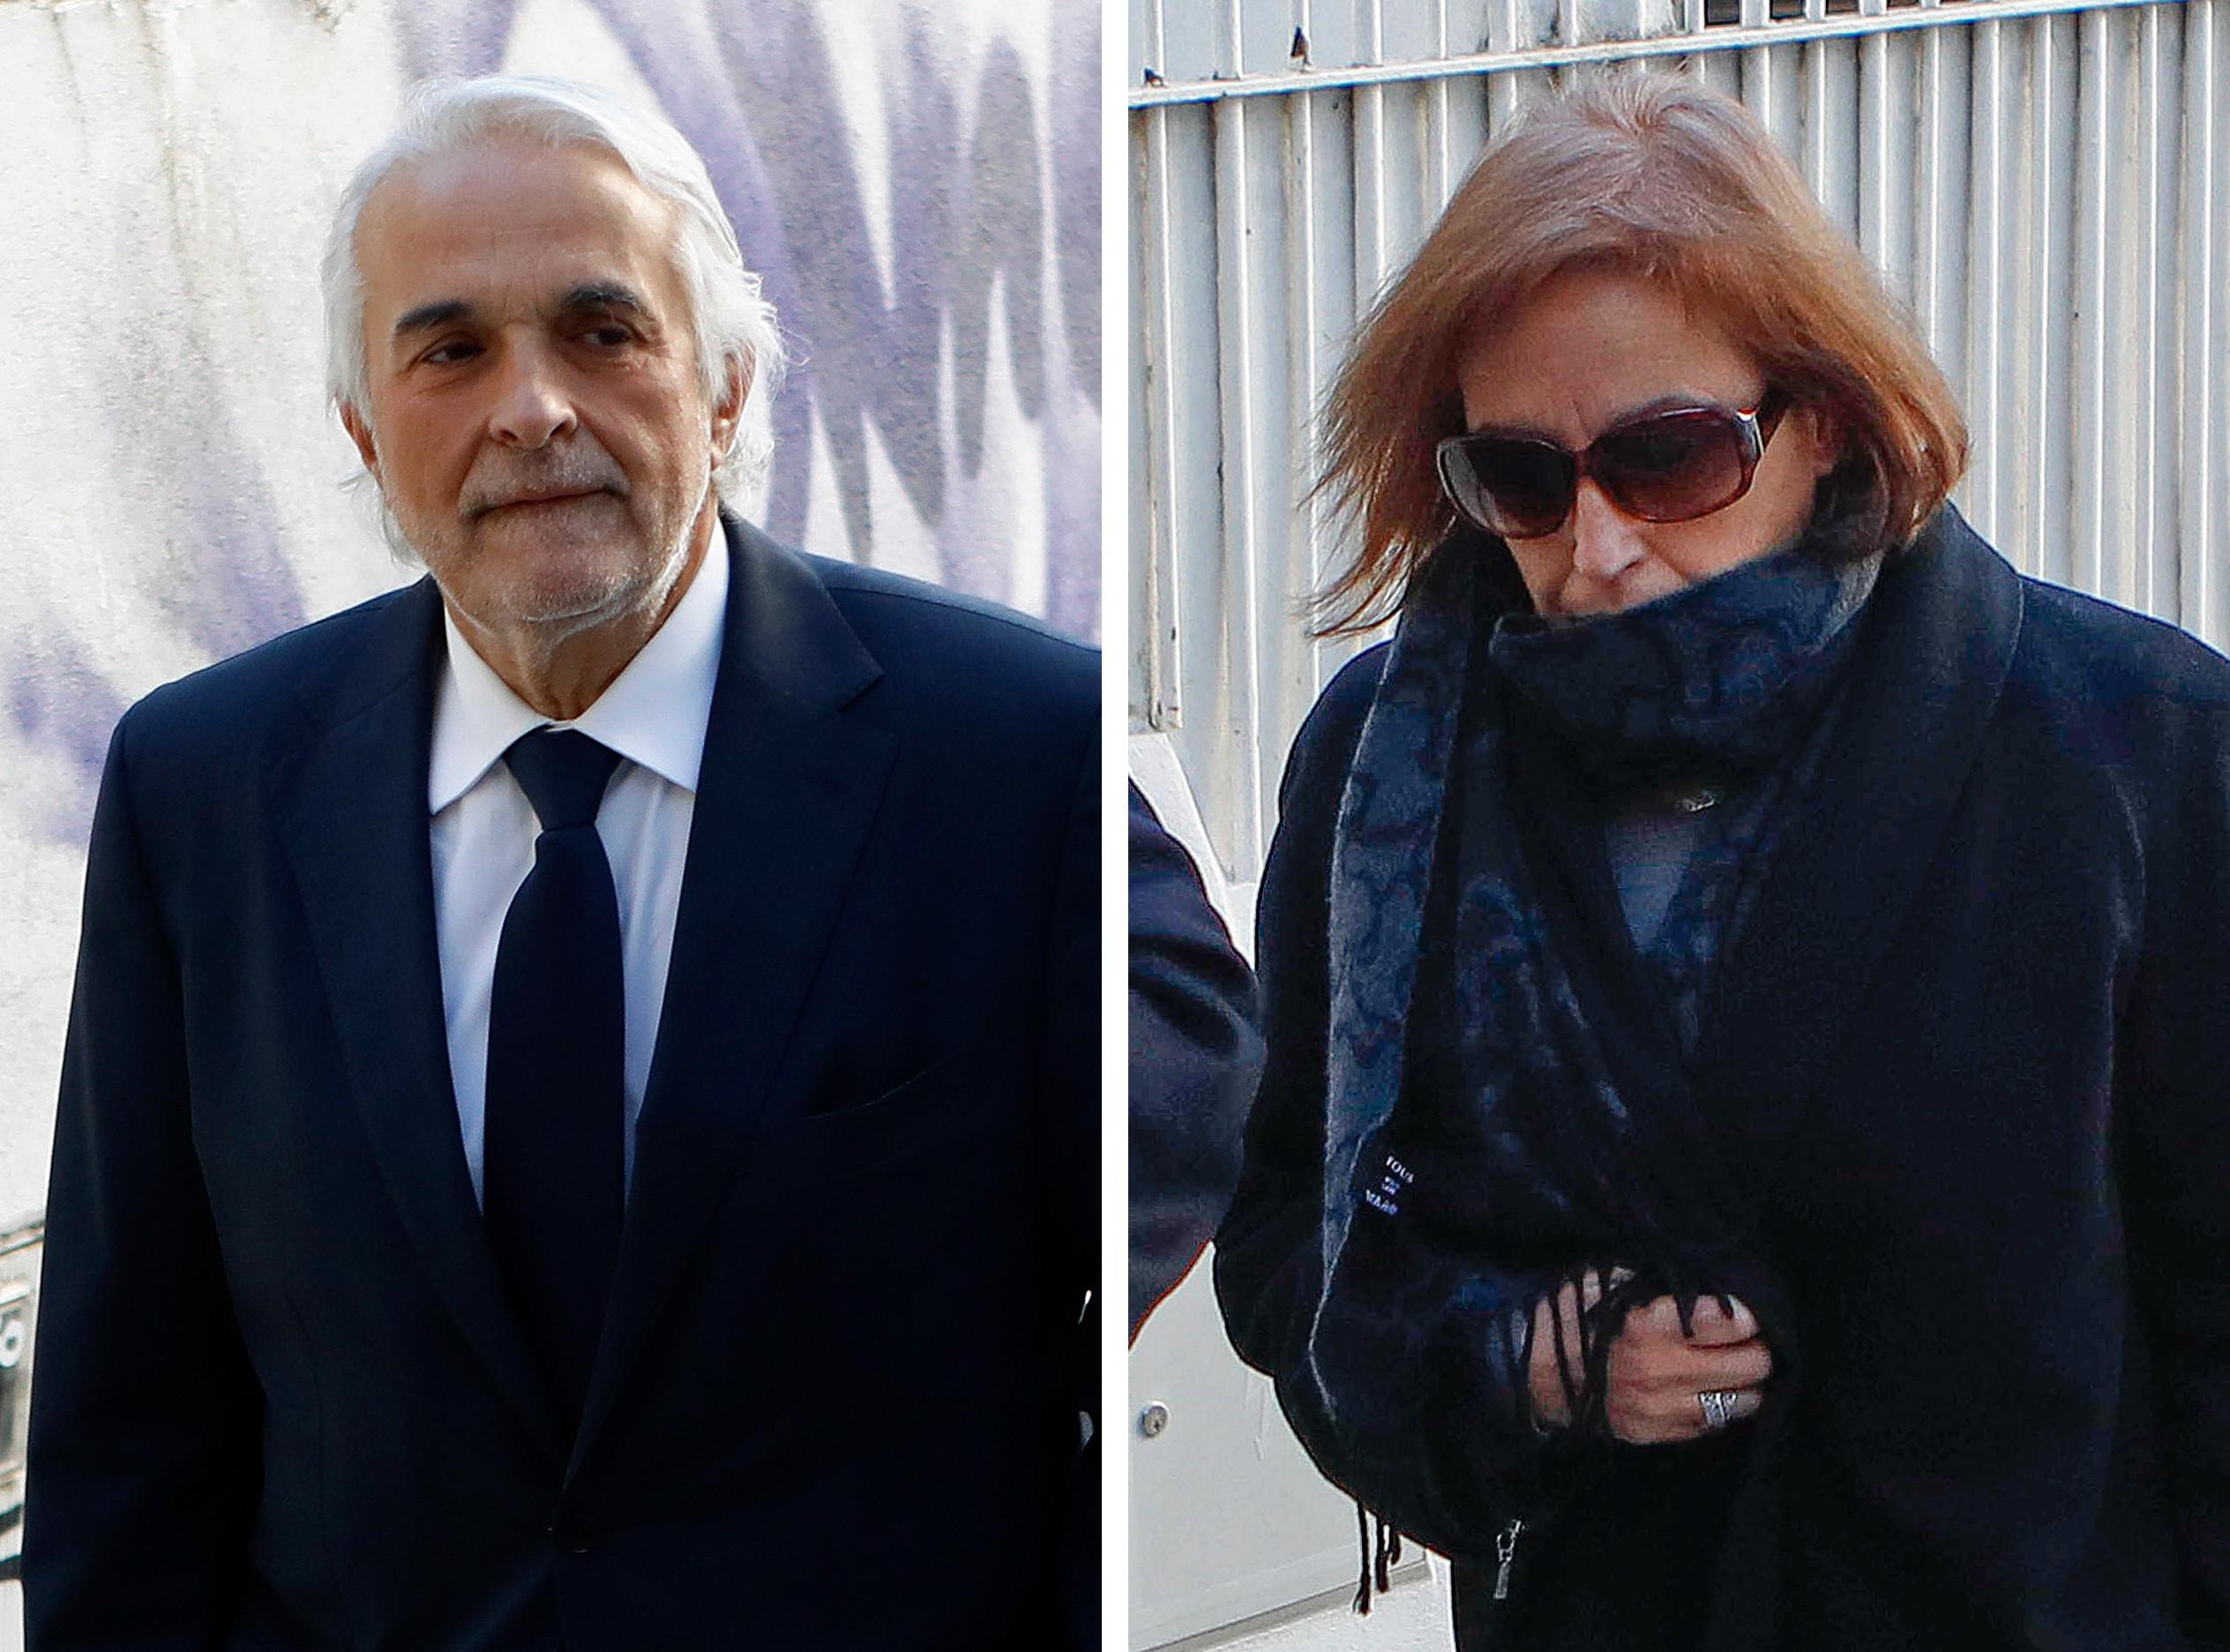 Juízes Rui Rangel e Fátima Galante alvo de processos disciplinares